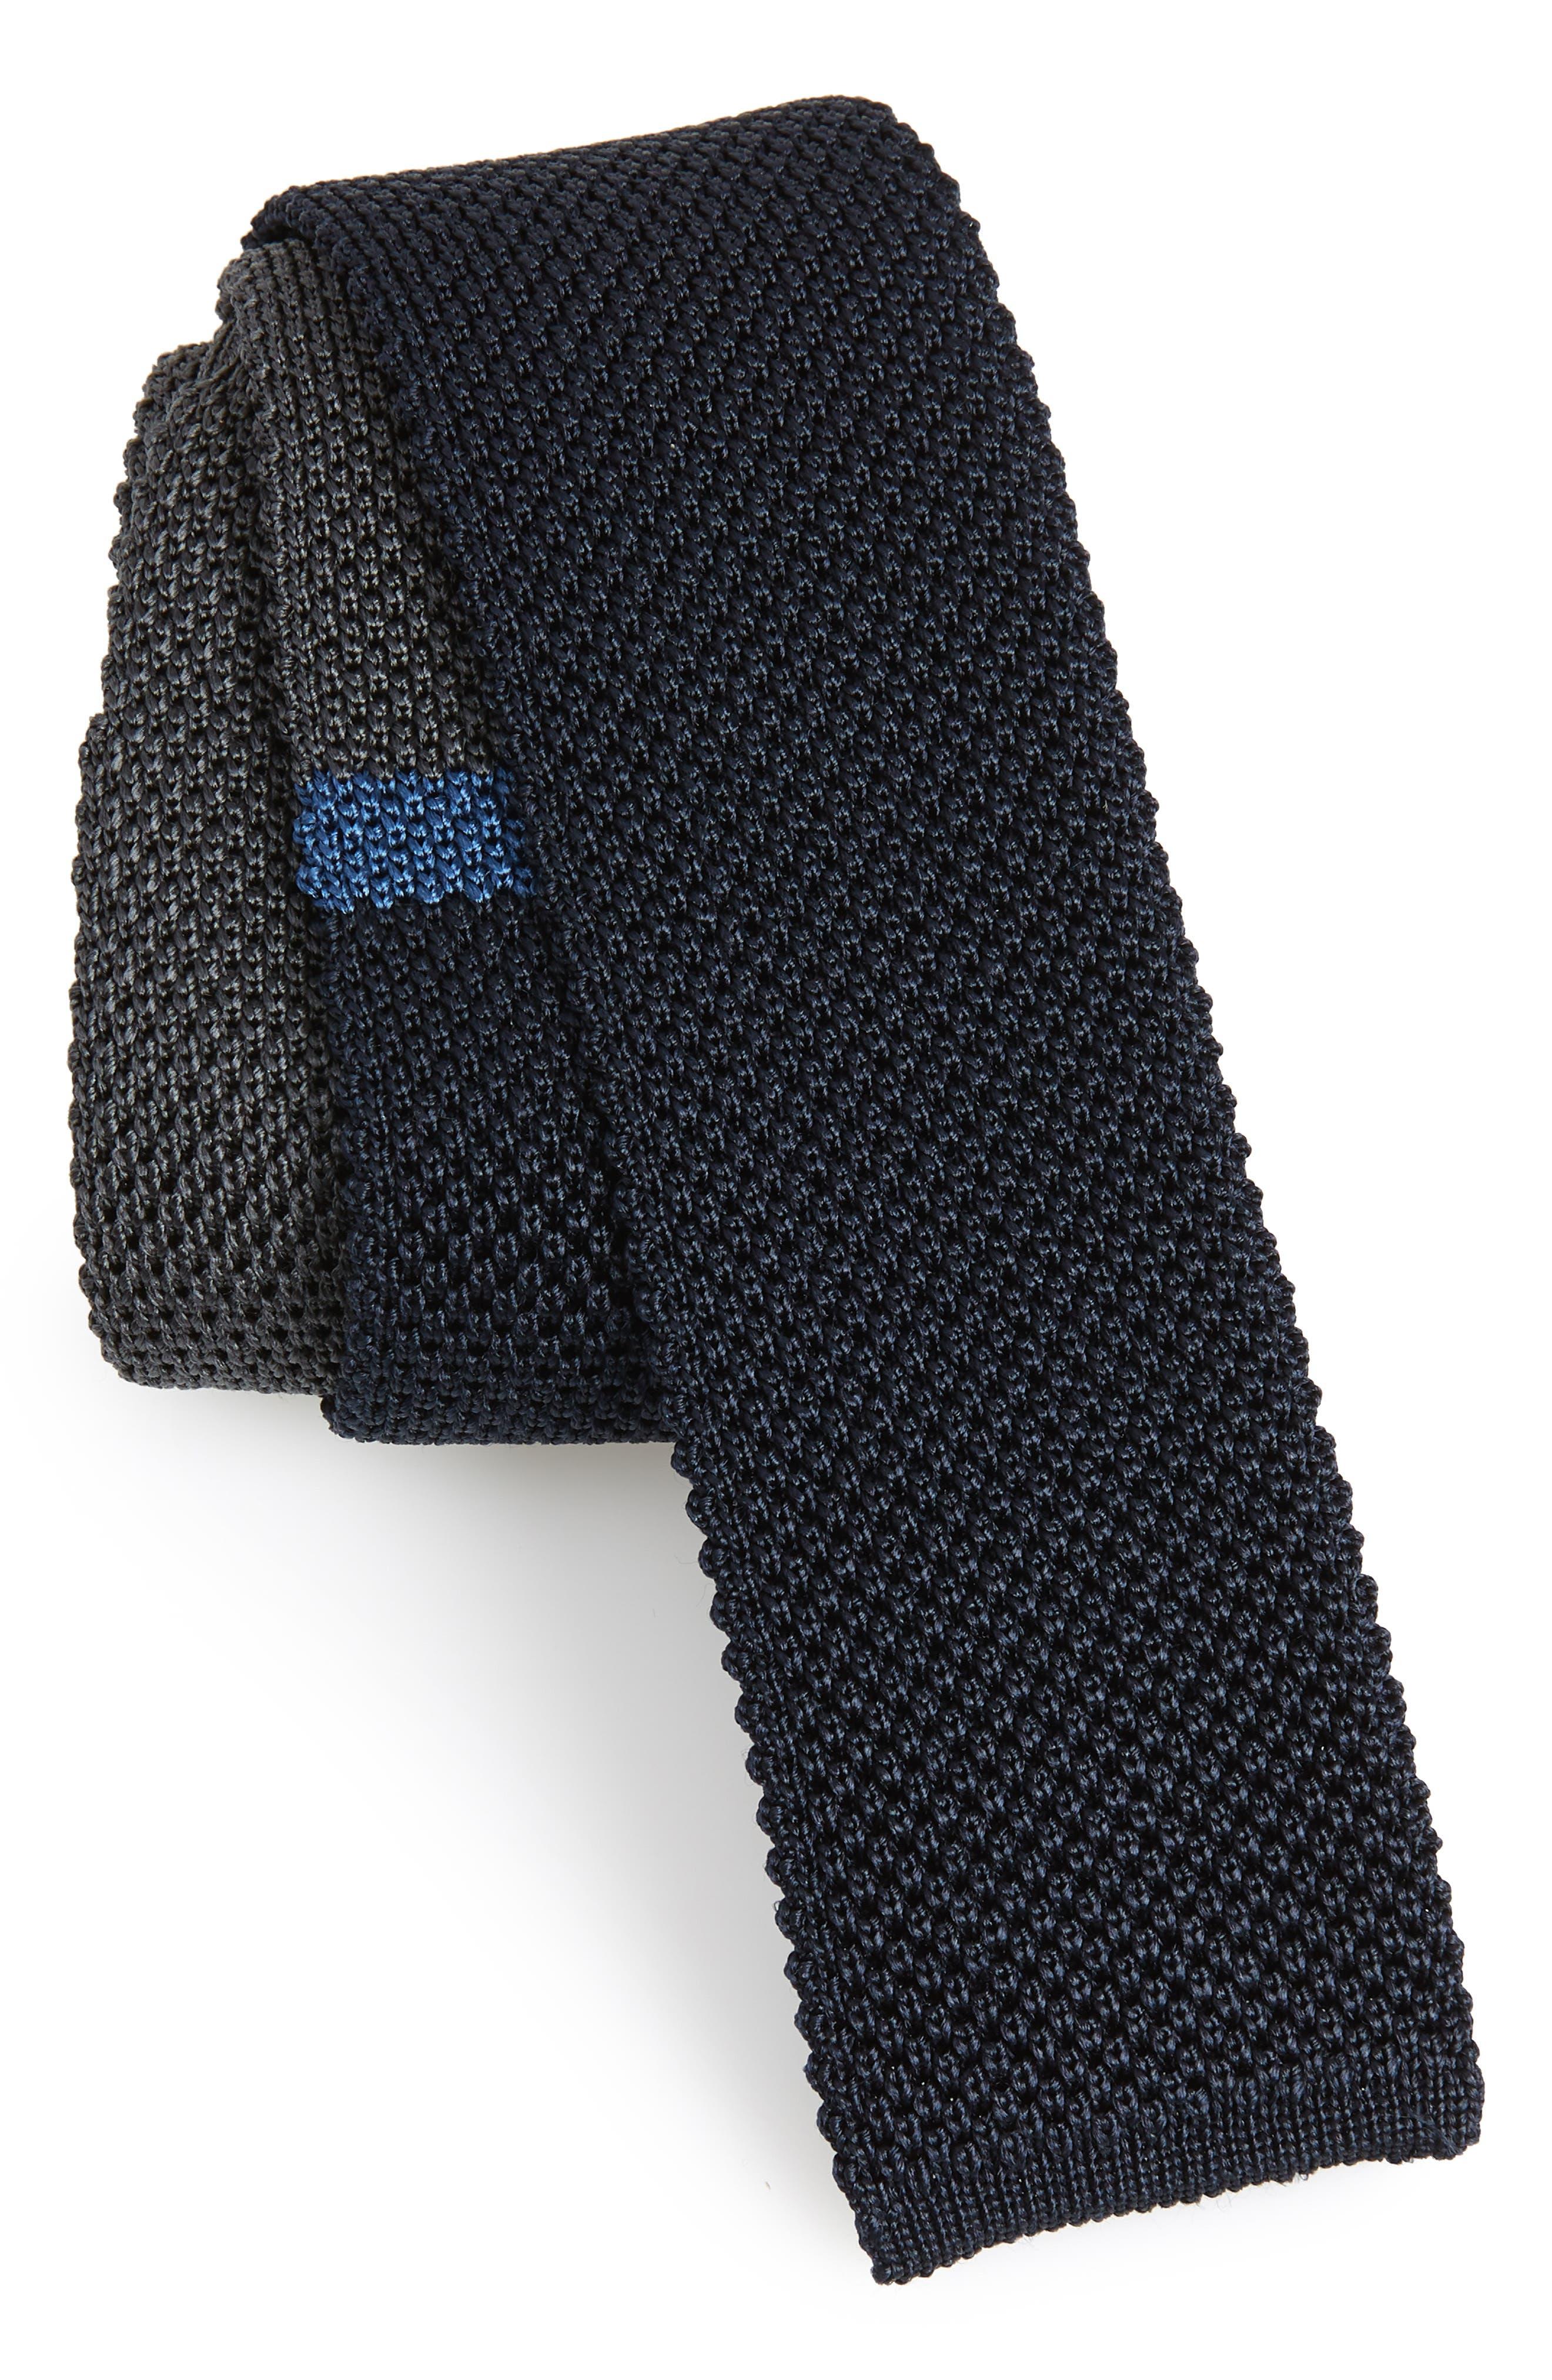 Egeo Knit Silk Tie,                             Main thumbnail 1, color,                             Blue/Grey